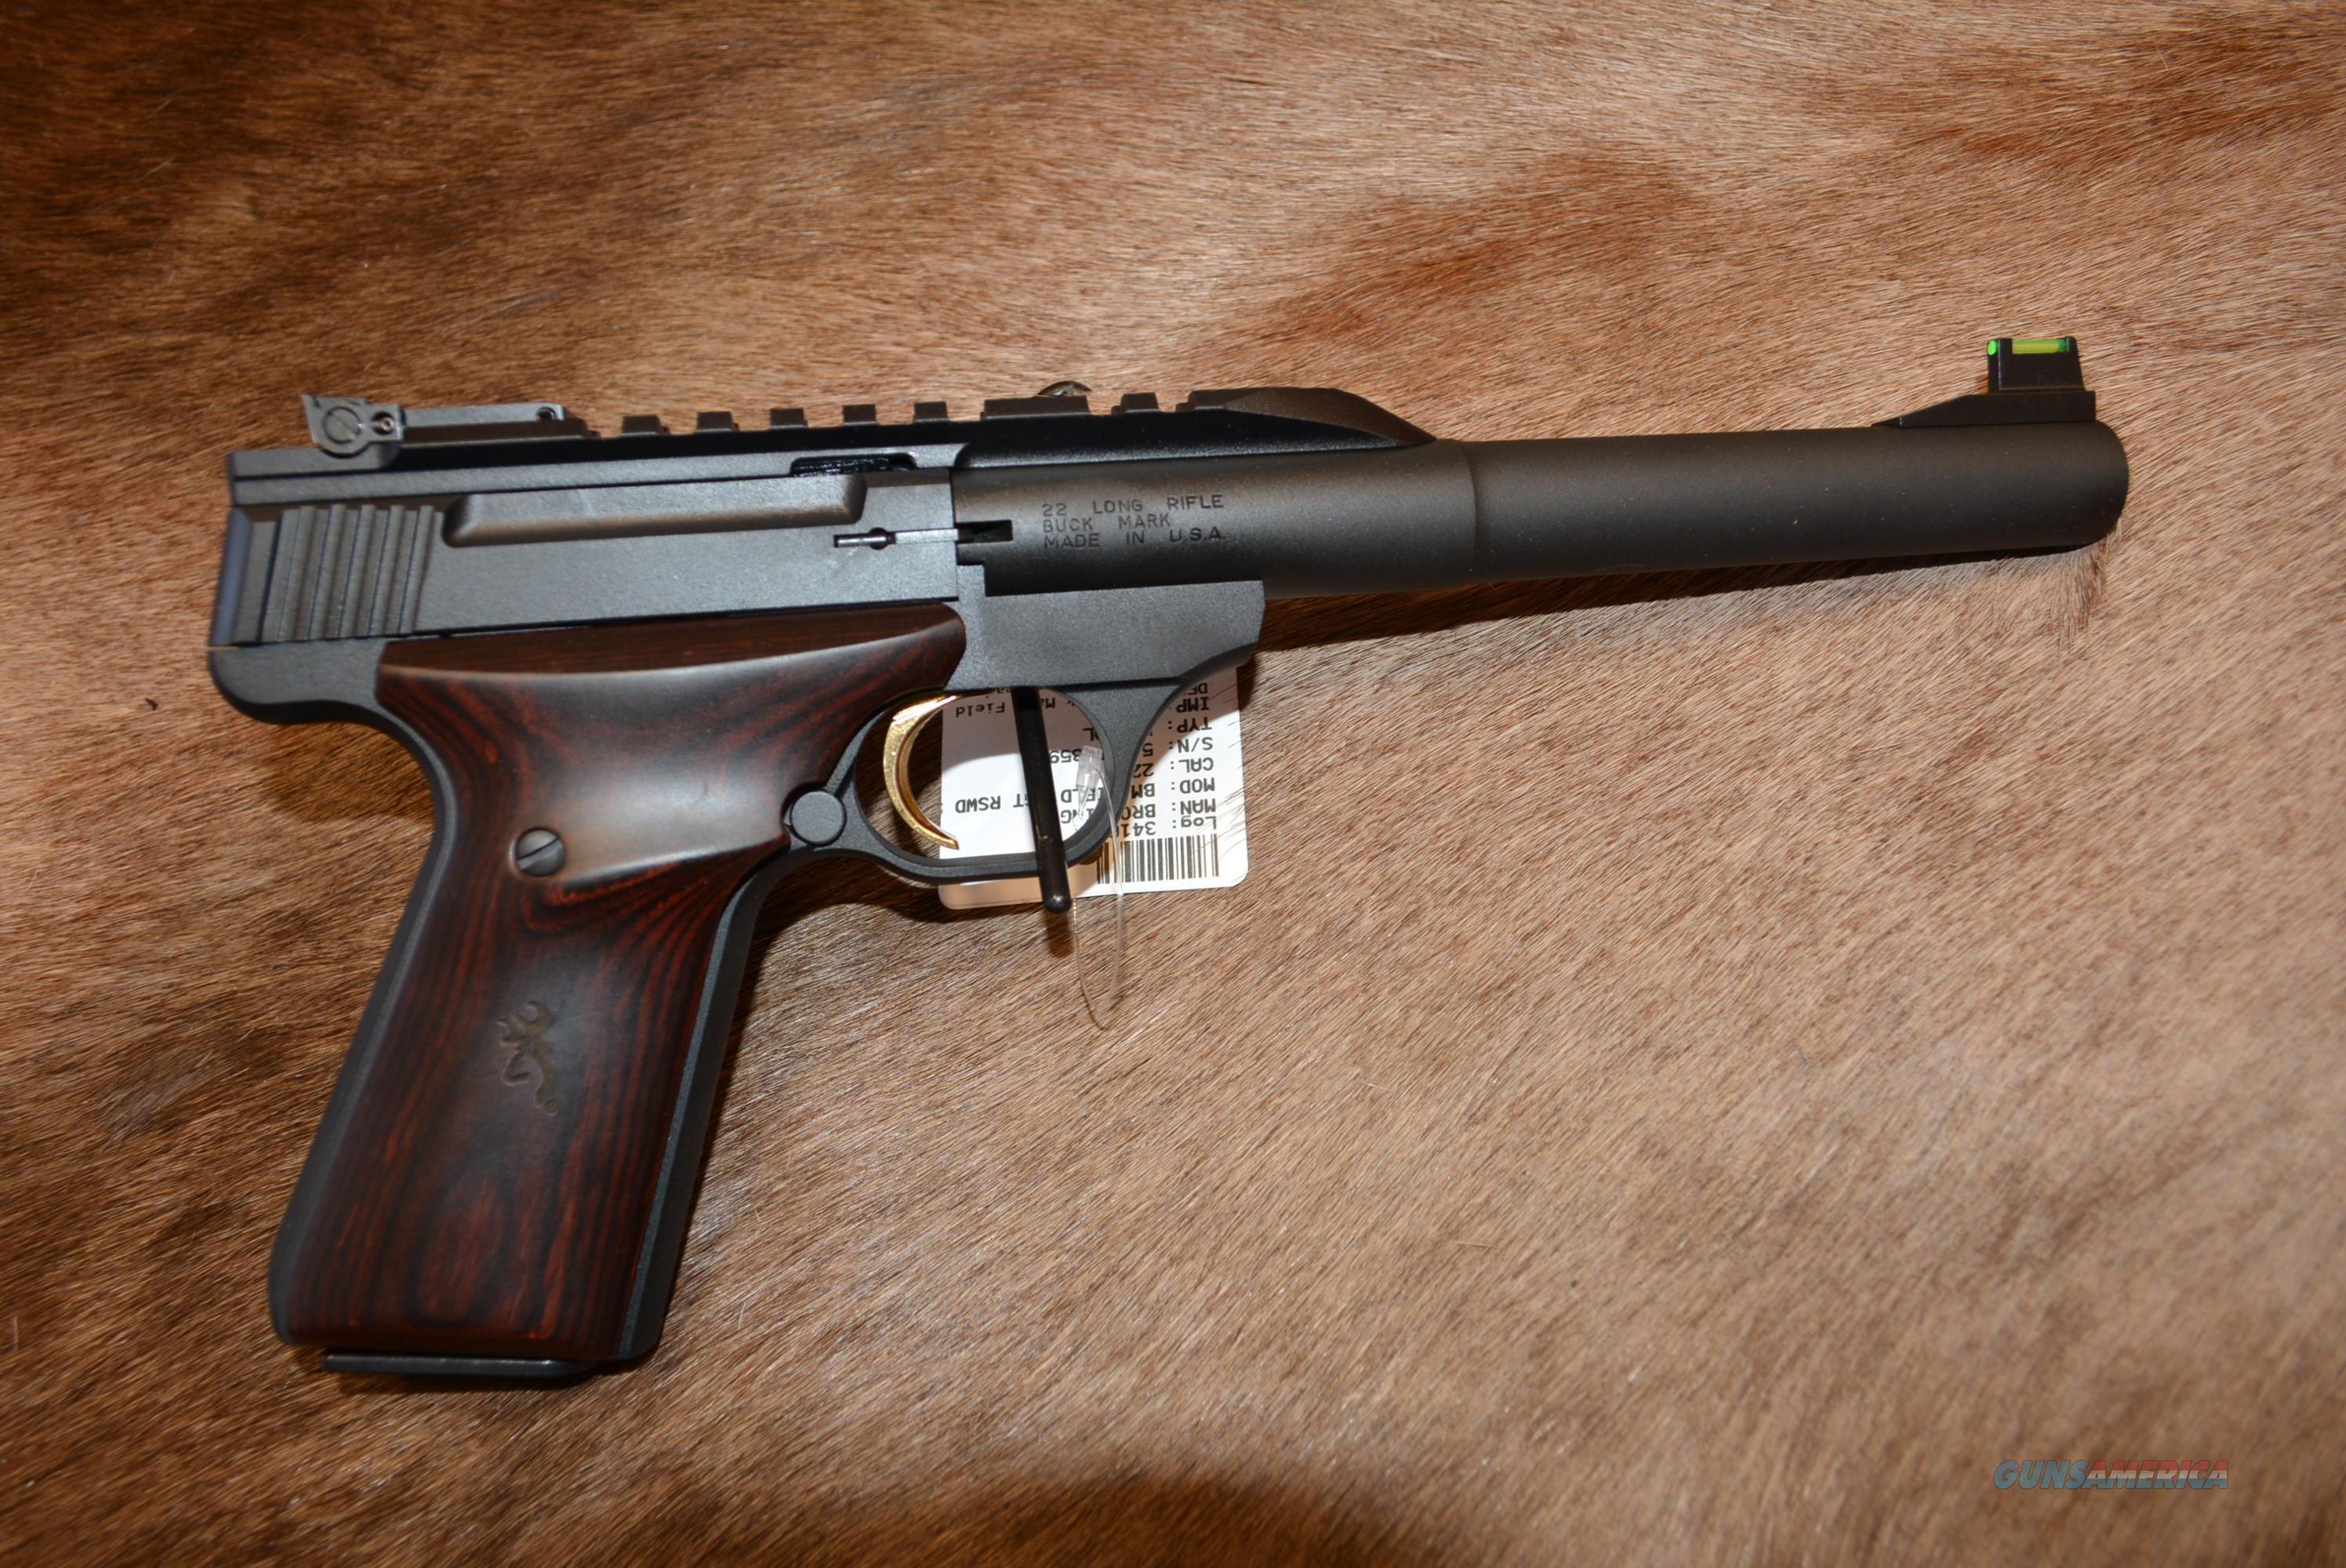 Browning Buckmark Field Target W/Rosewood  Guns > Pistols > Browning Pistols > Buckmark